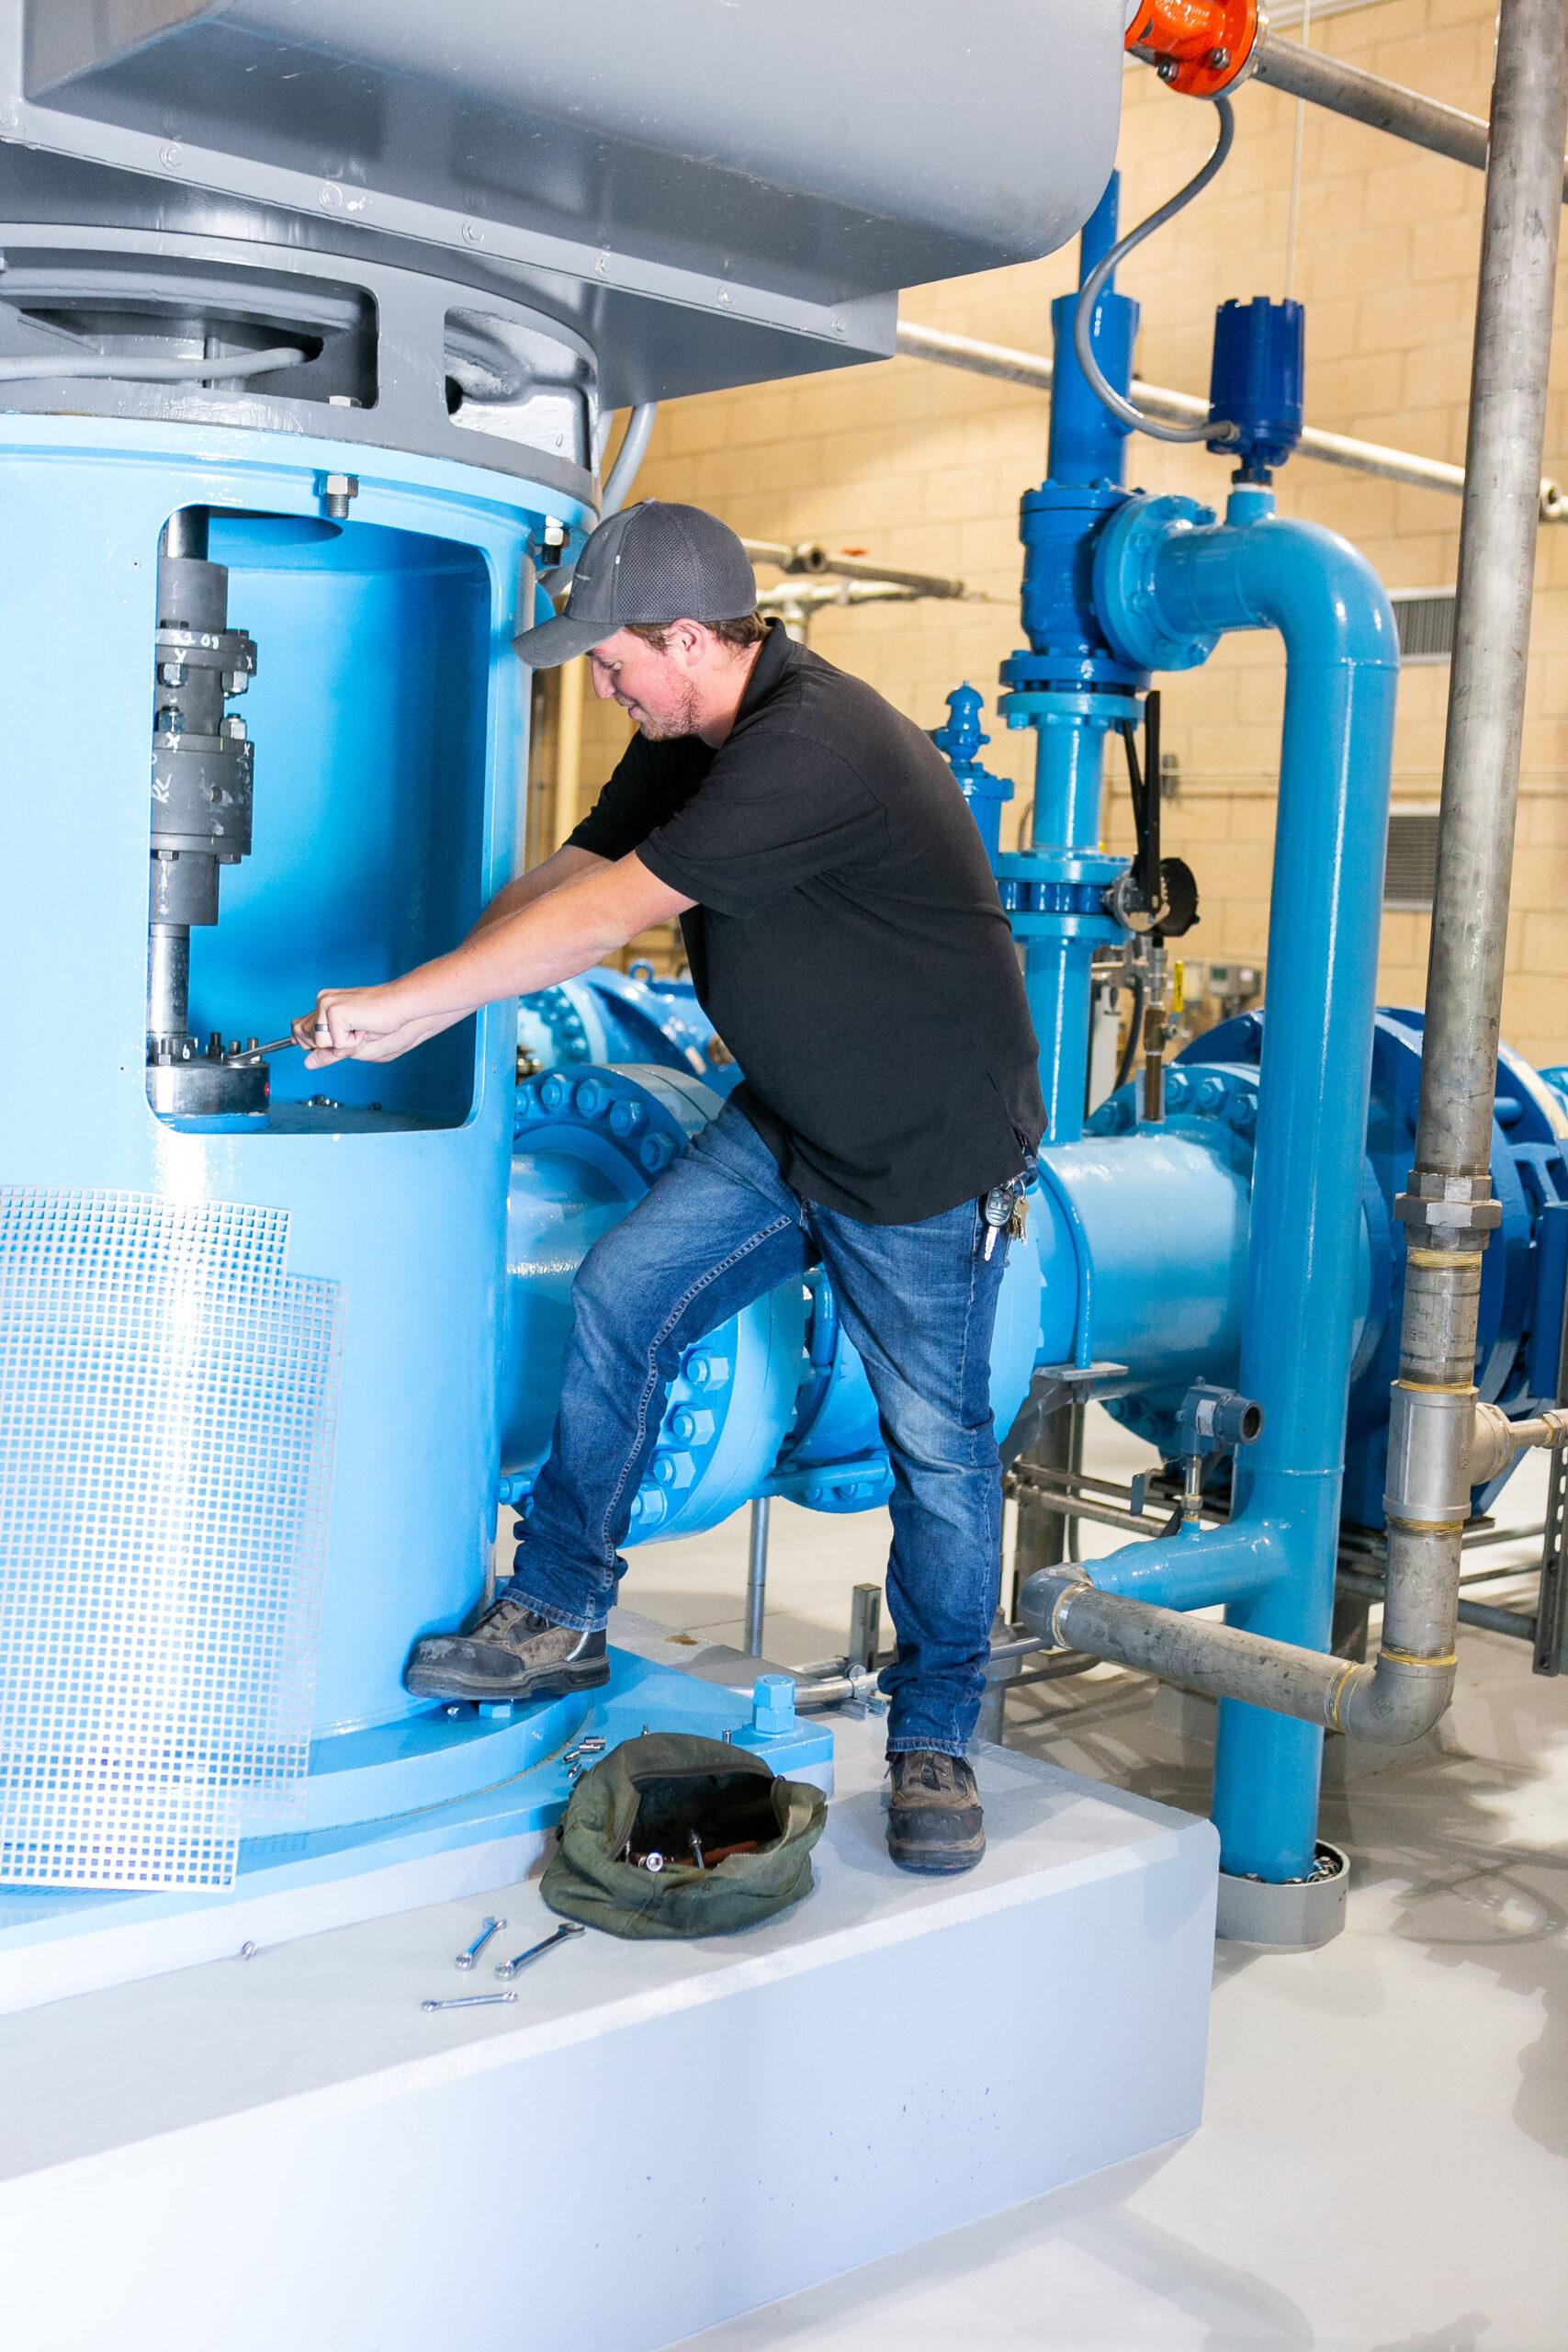 San Bernardino Valley Municipal Water District employee repairing pipe